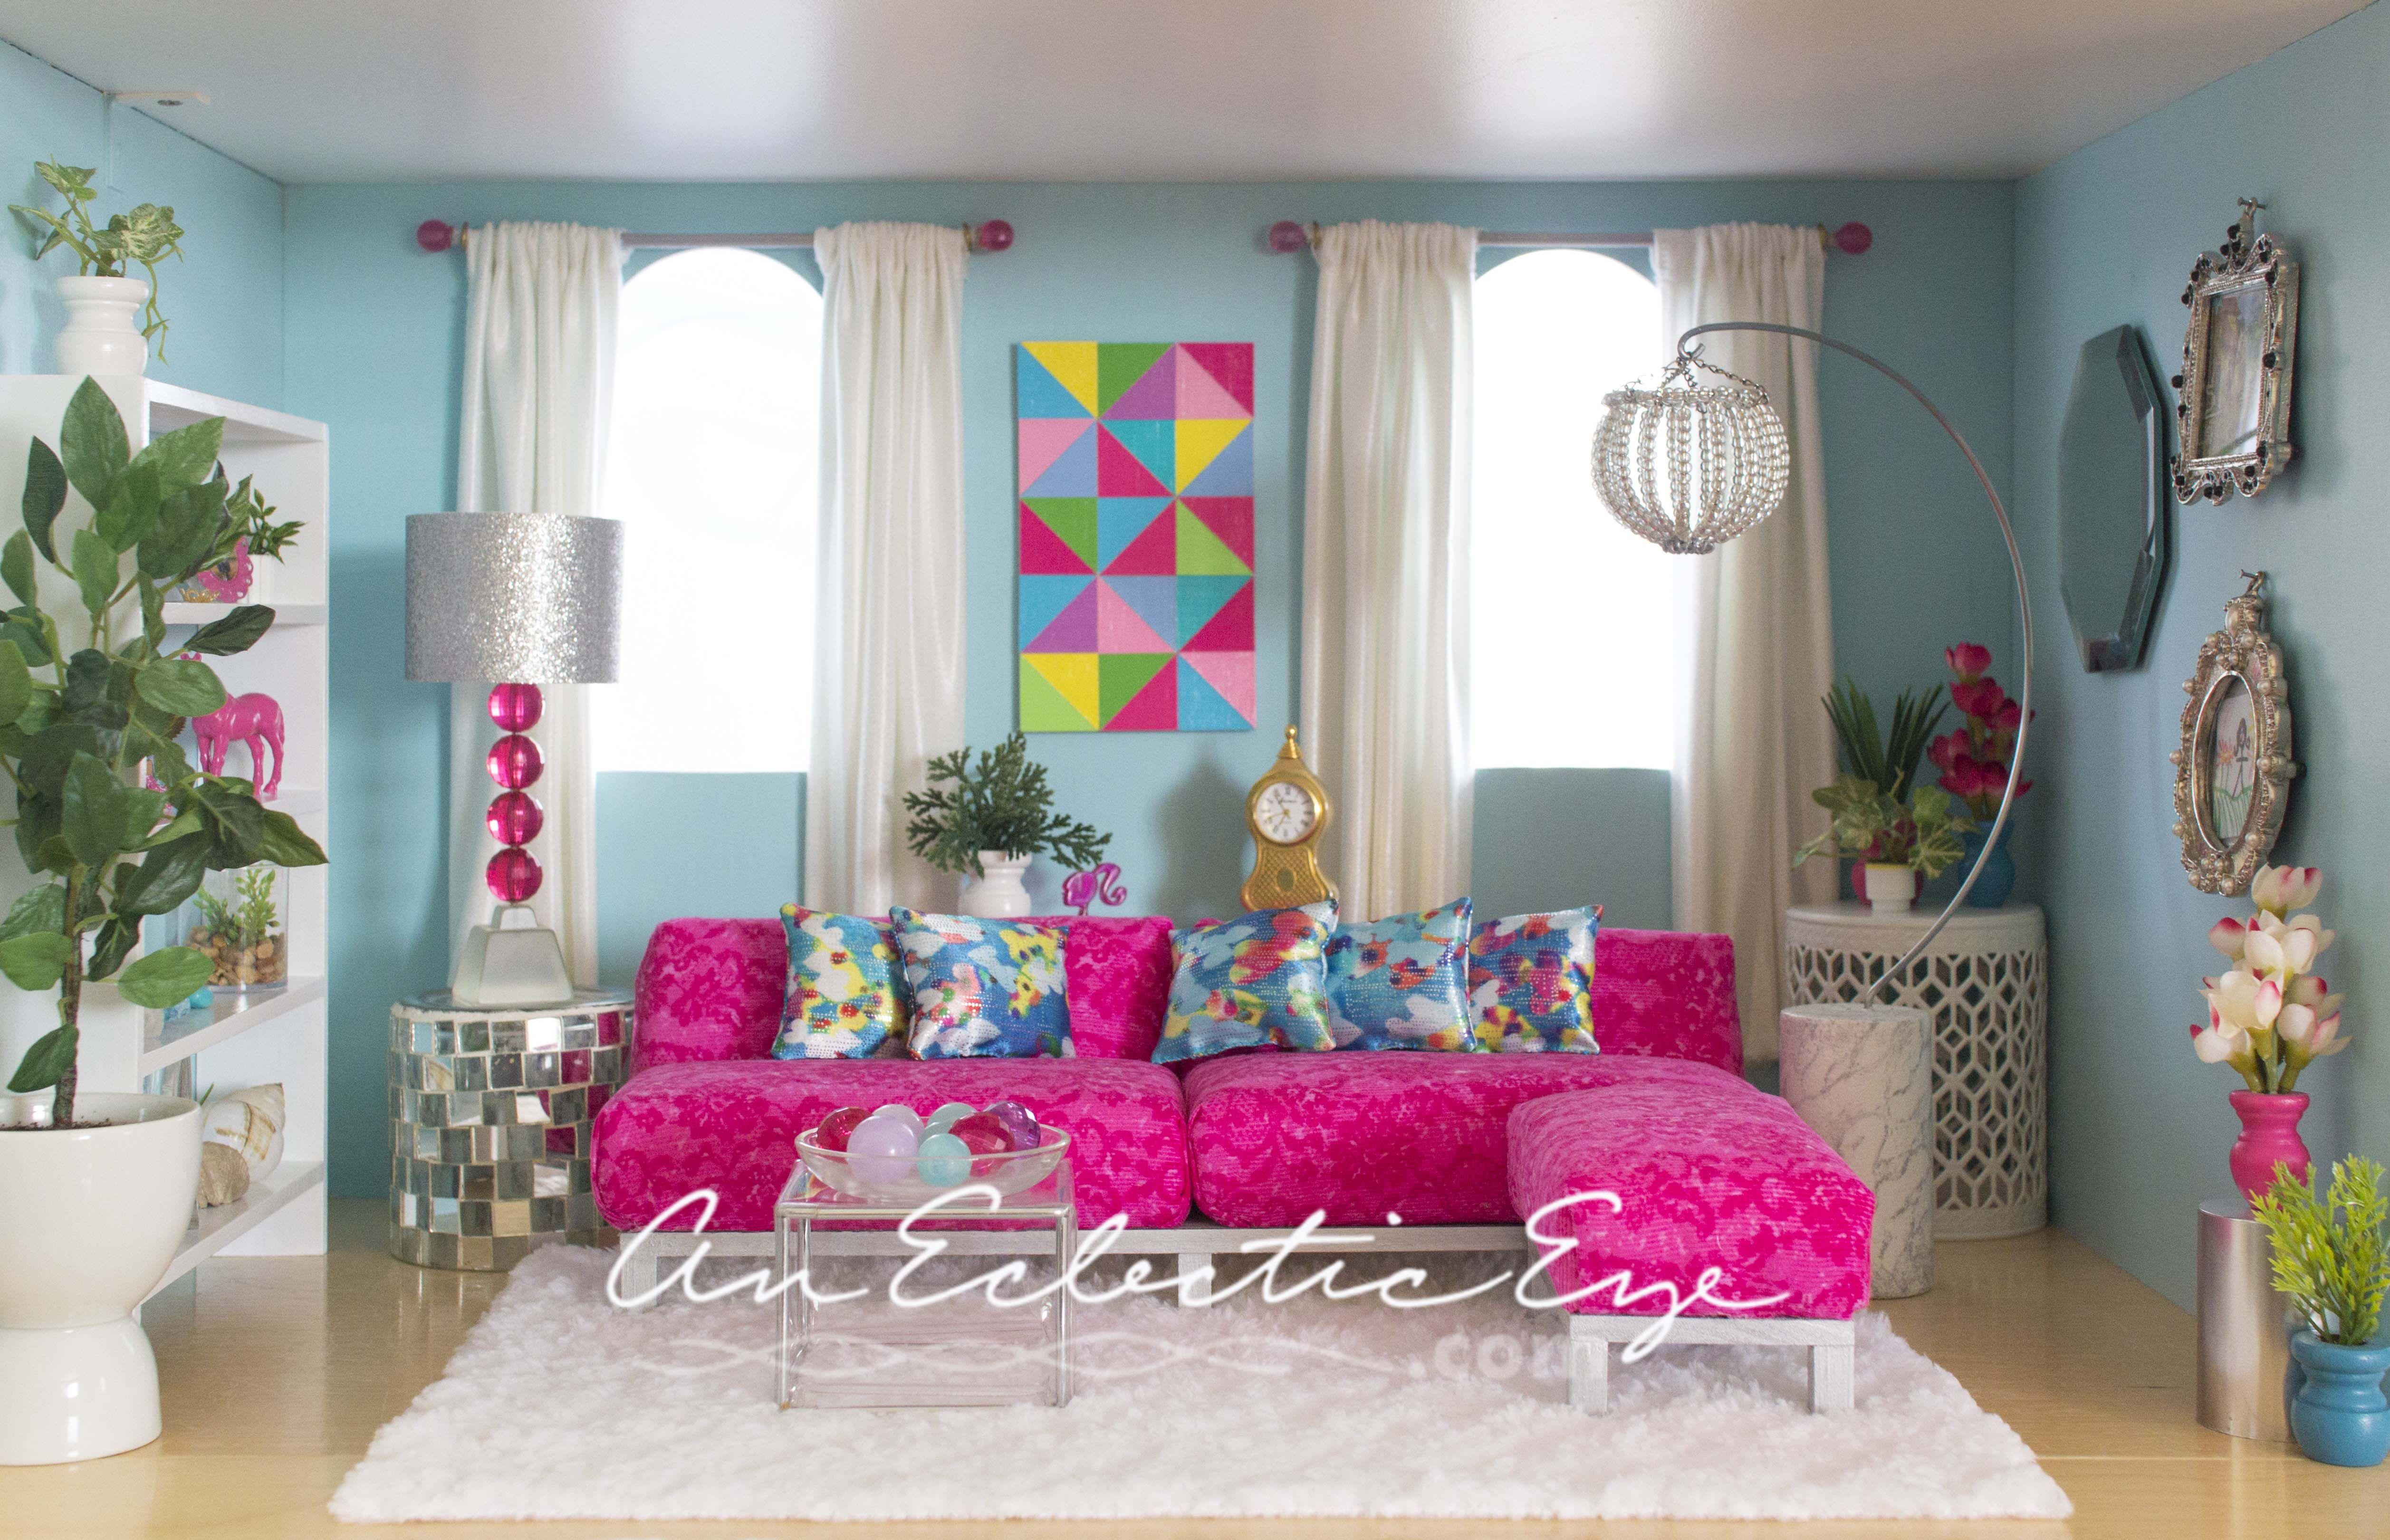 1 6 Scale Barbie Livingroom My Diys Pinterest Scale Dolls And Barbie House